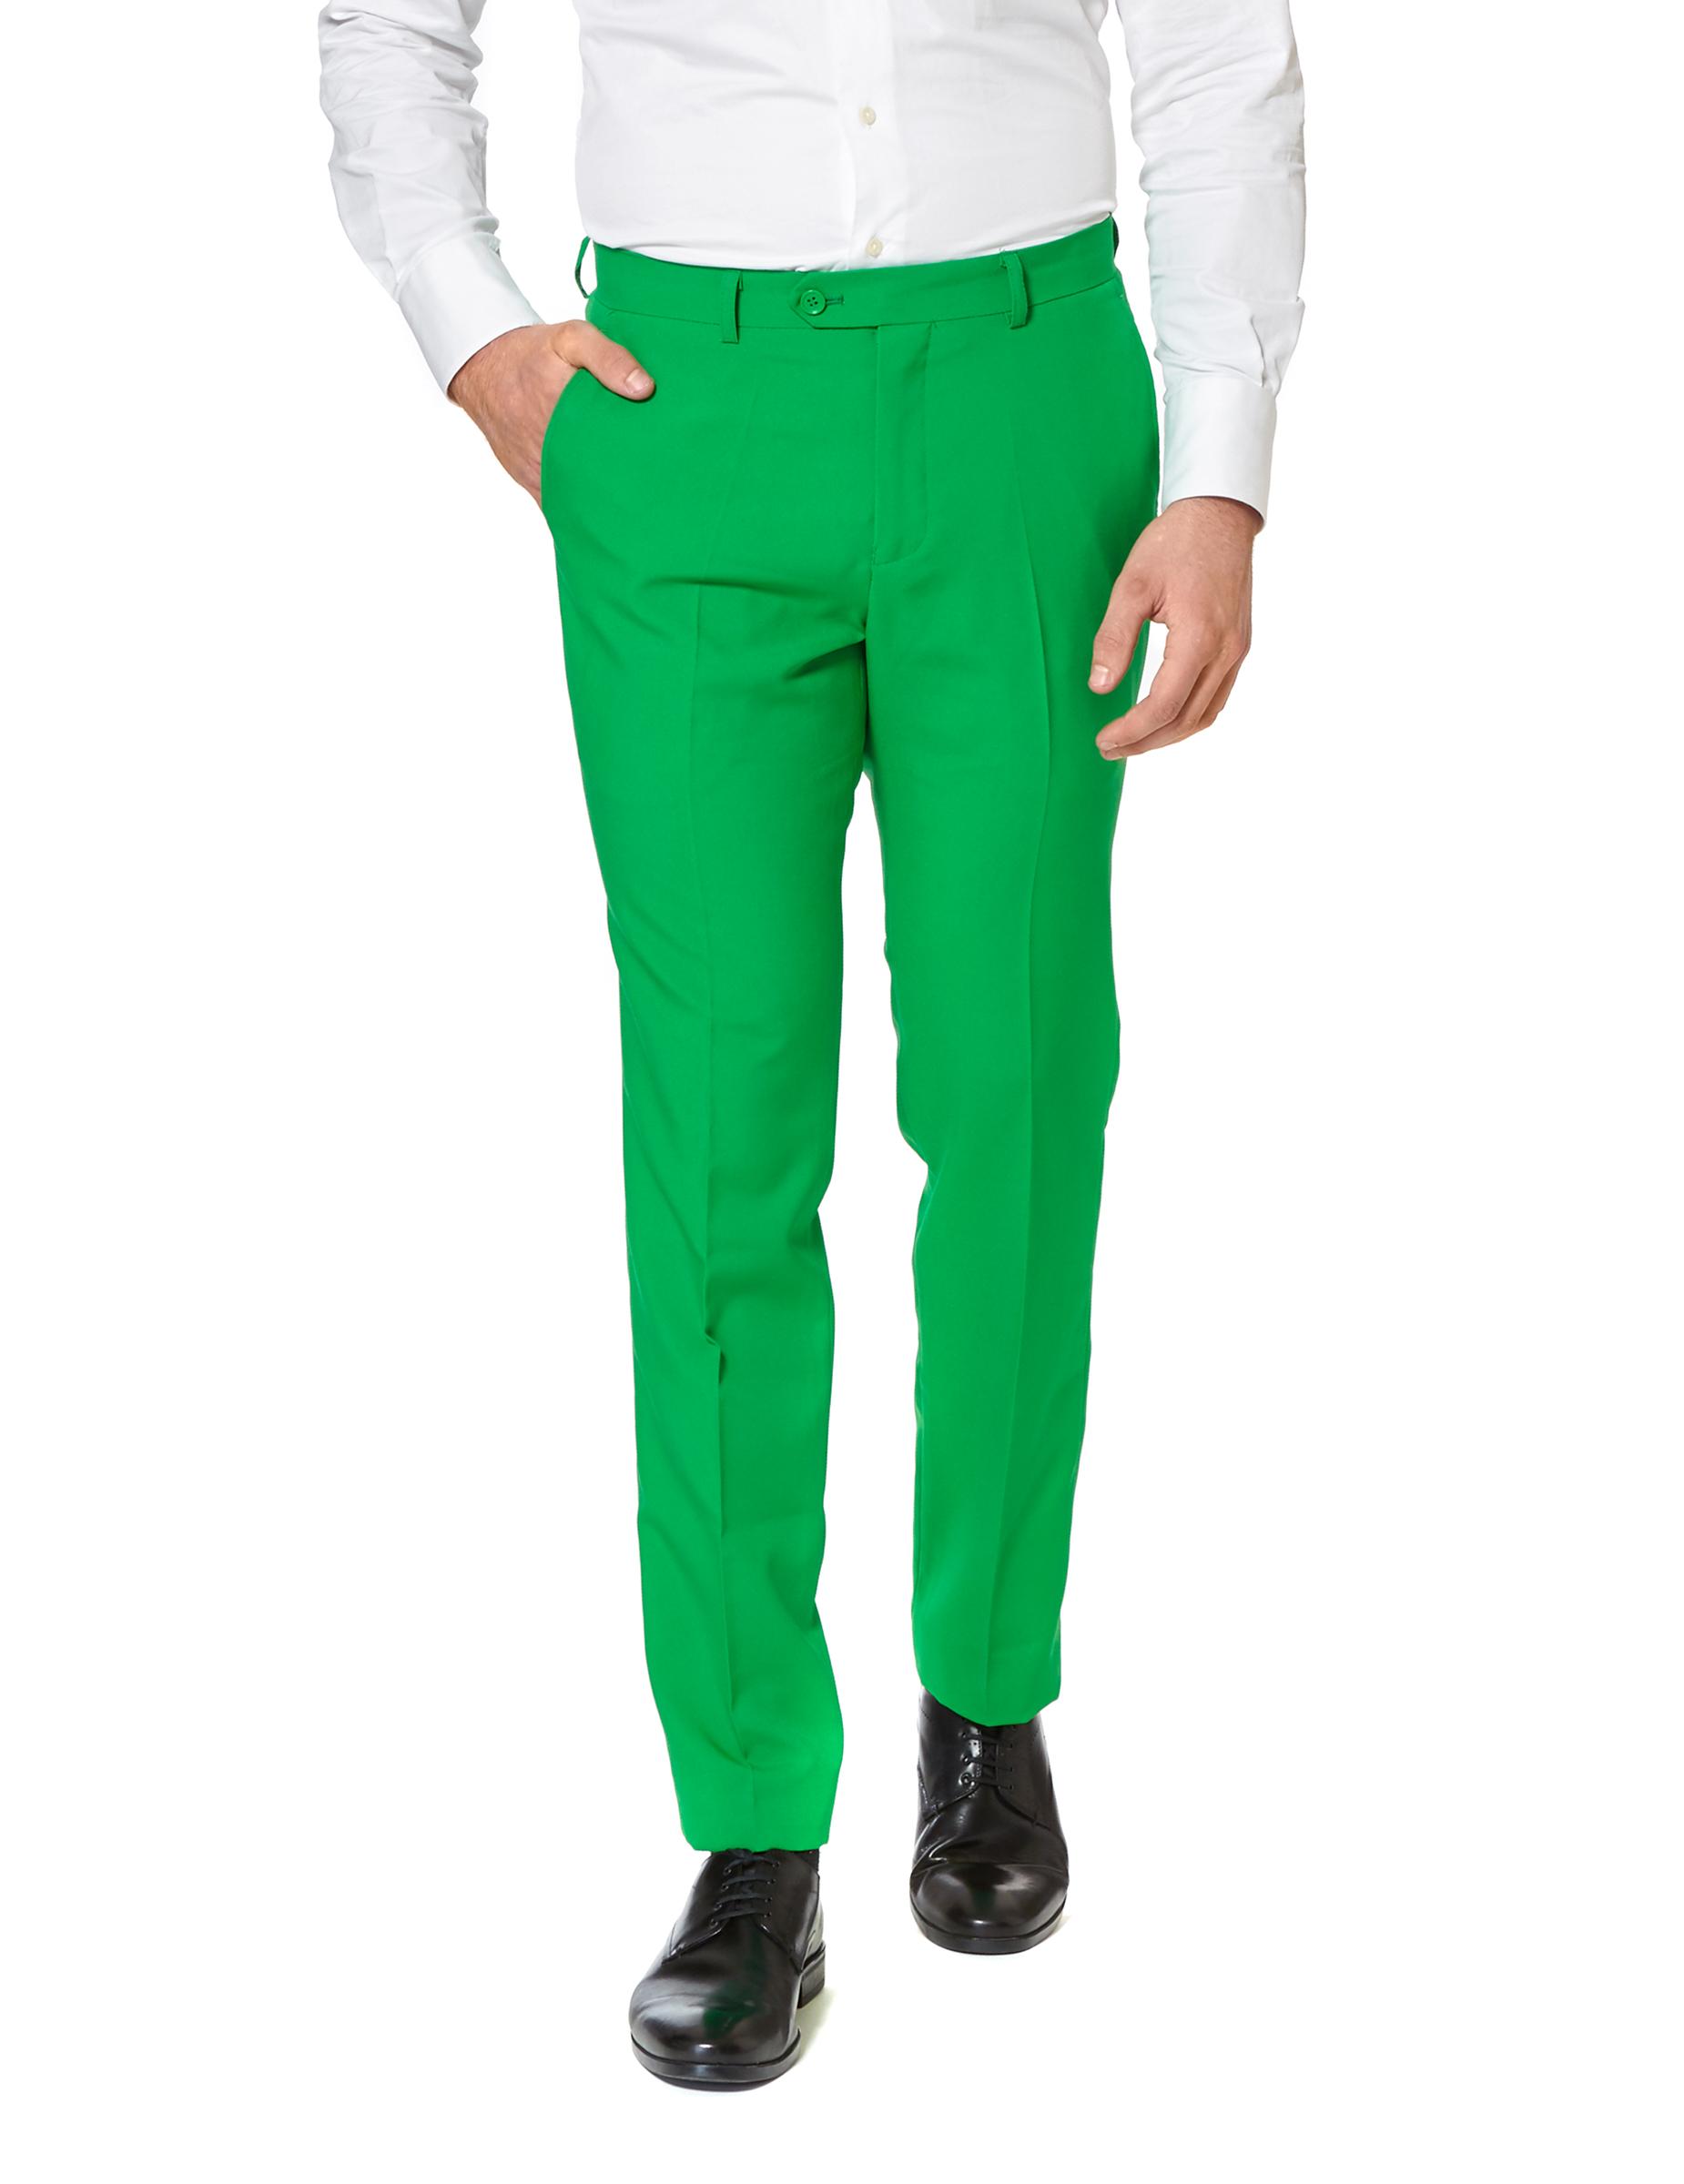 4604f796b5 Costume Brasile di Opposuits™ per uomo